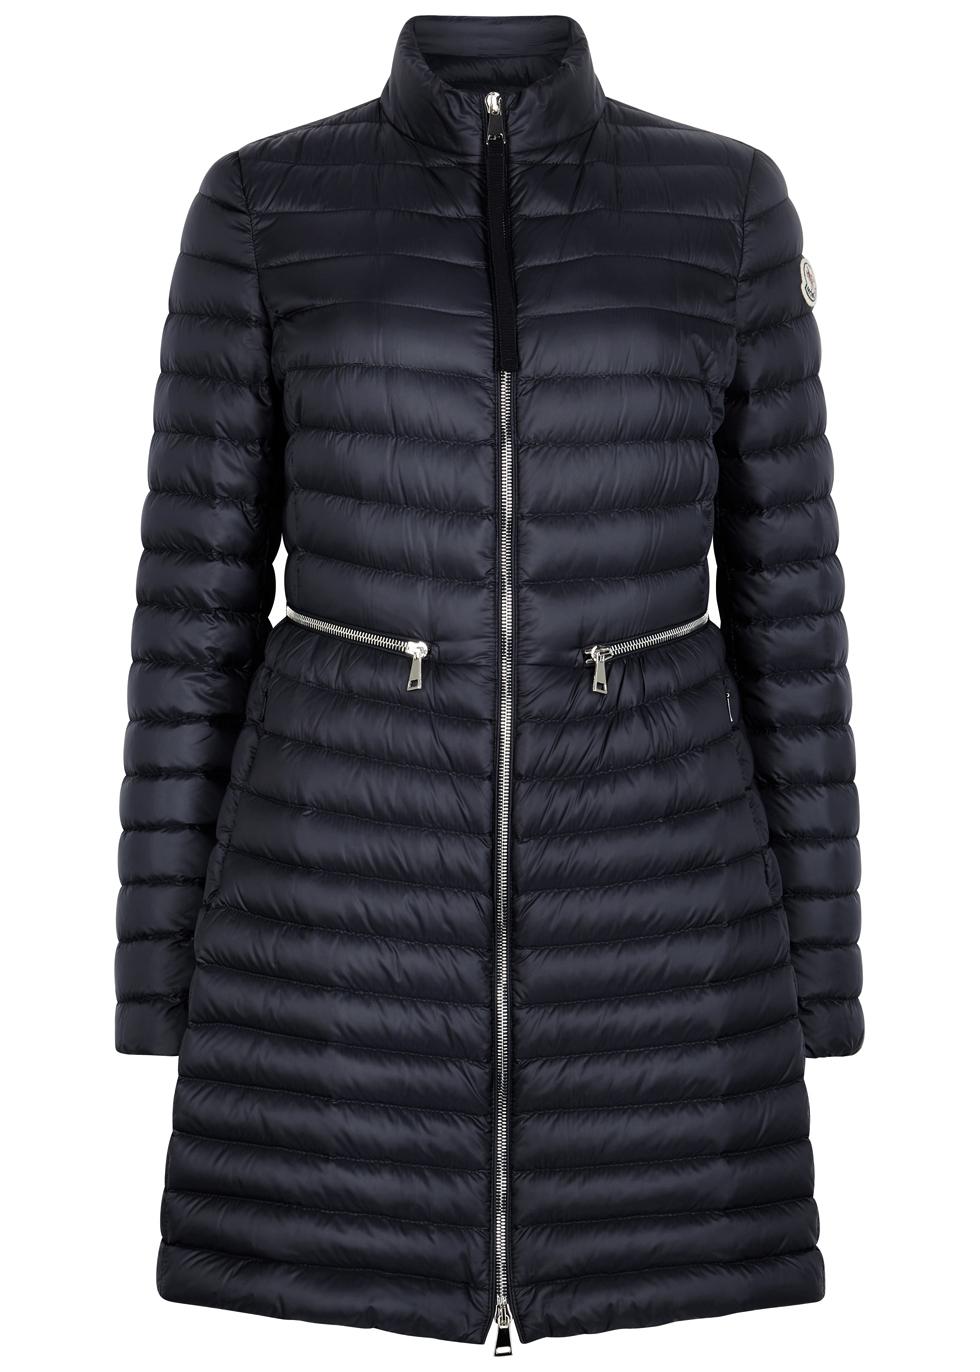 moncler jacket harvey nichols